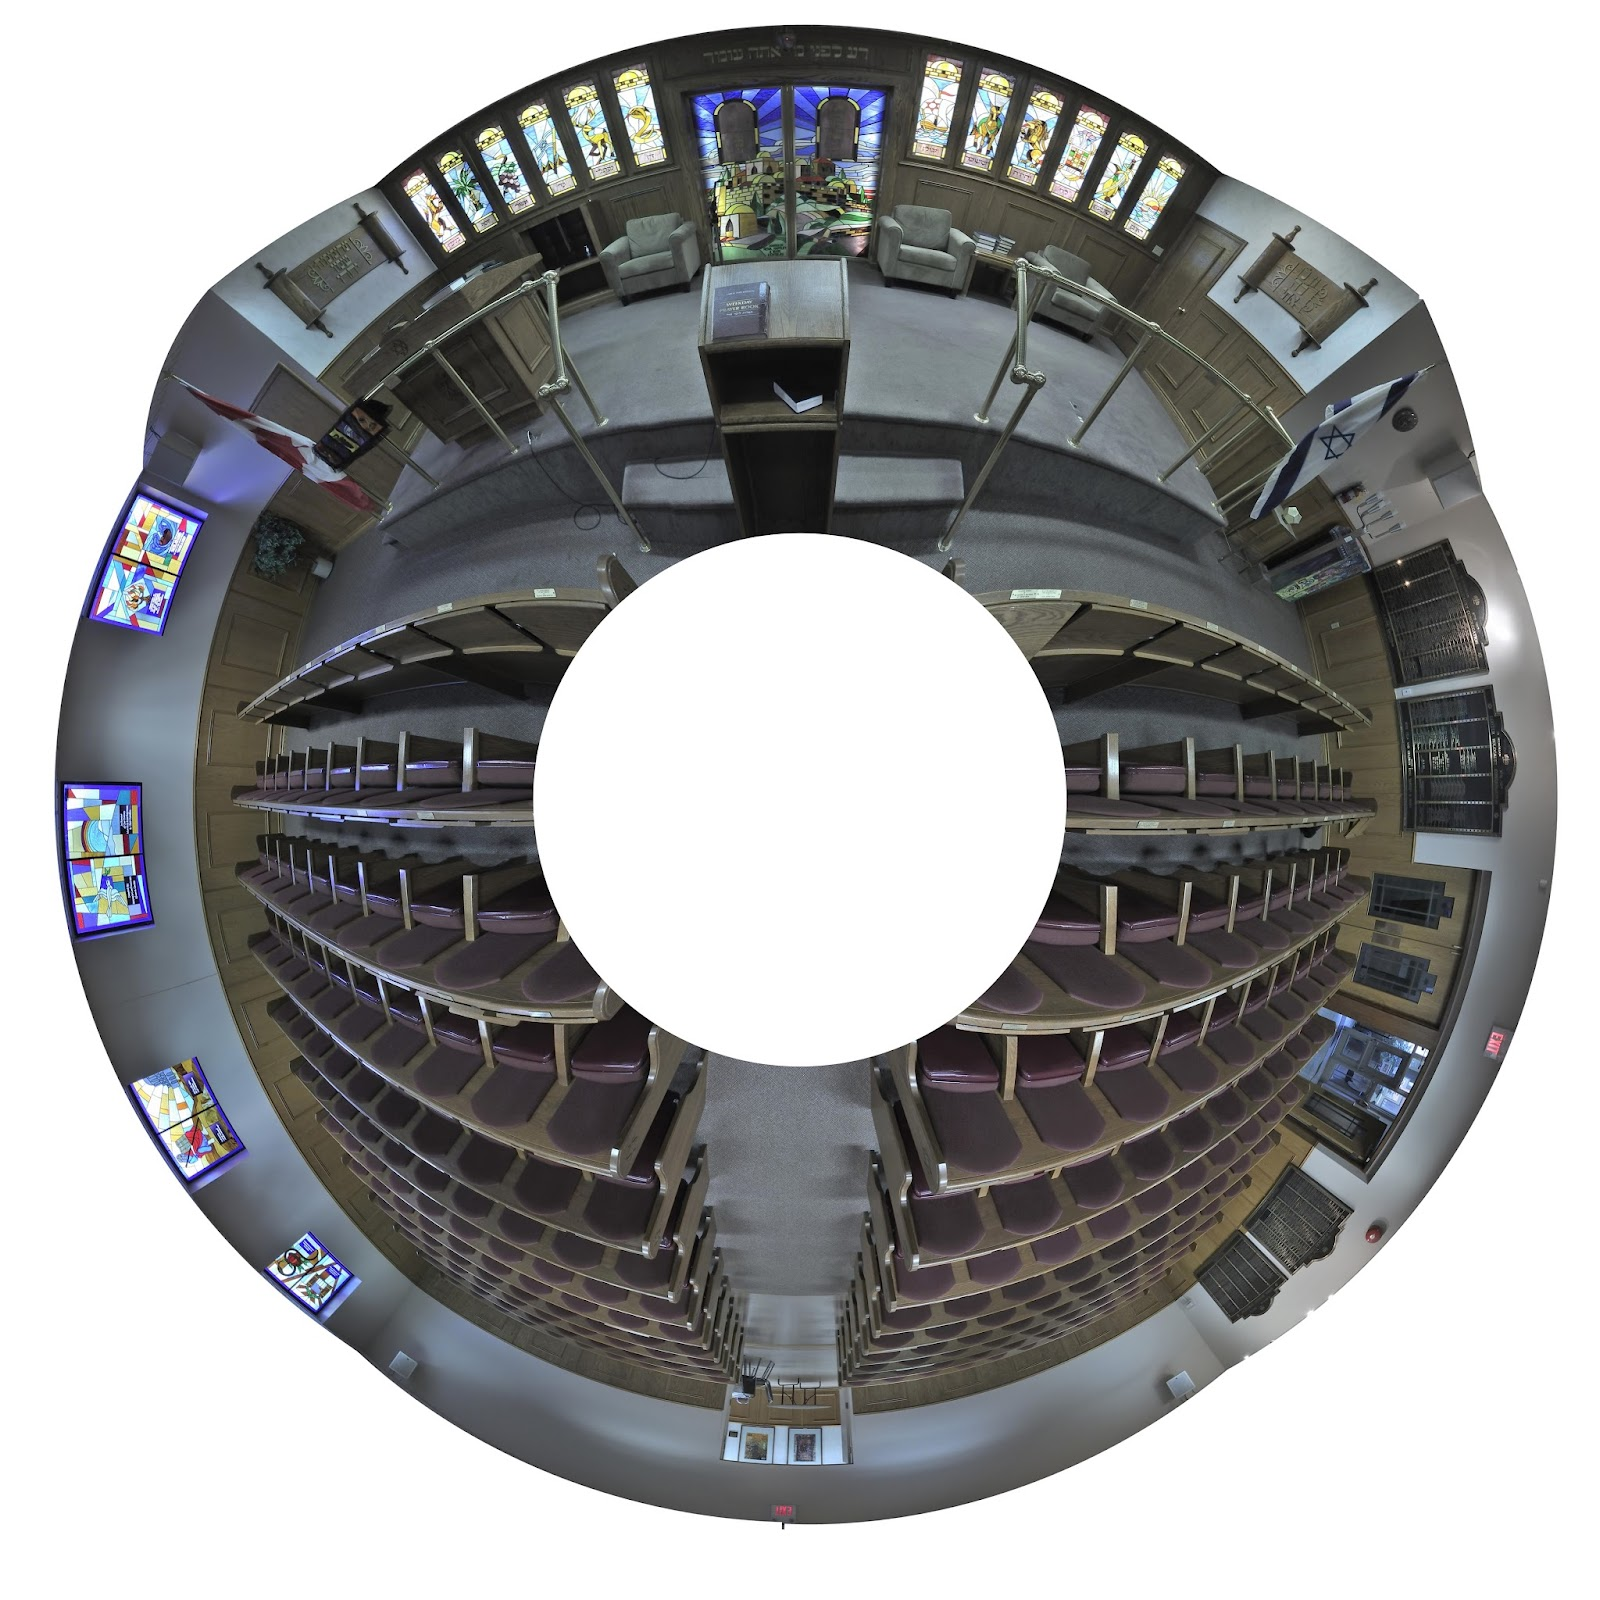 20151120_1227-LodzerSanctuary-3planet.jpg